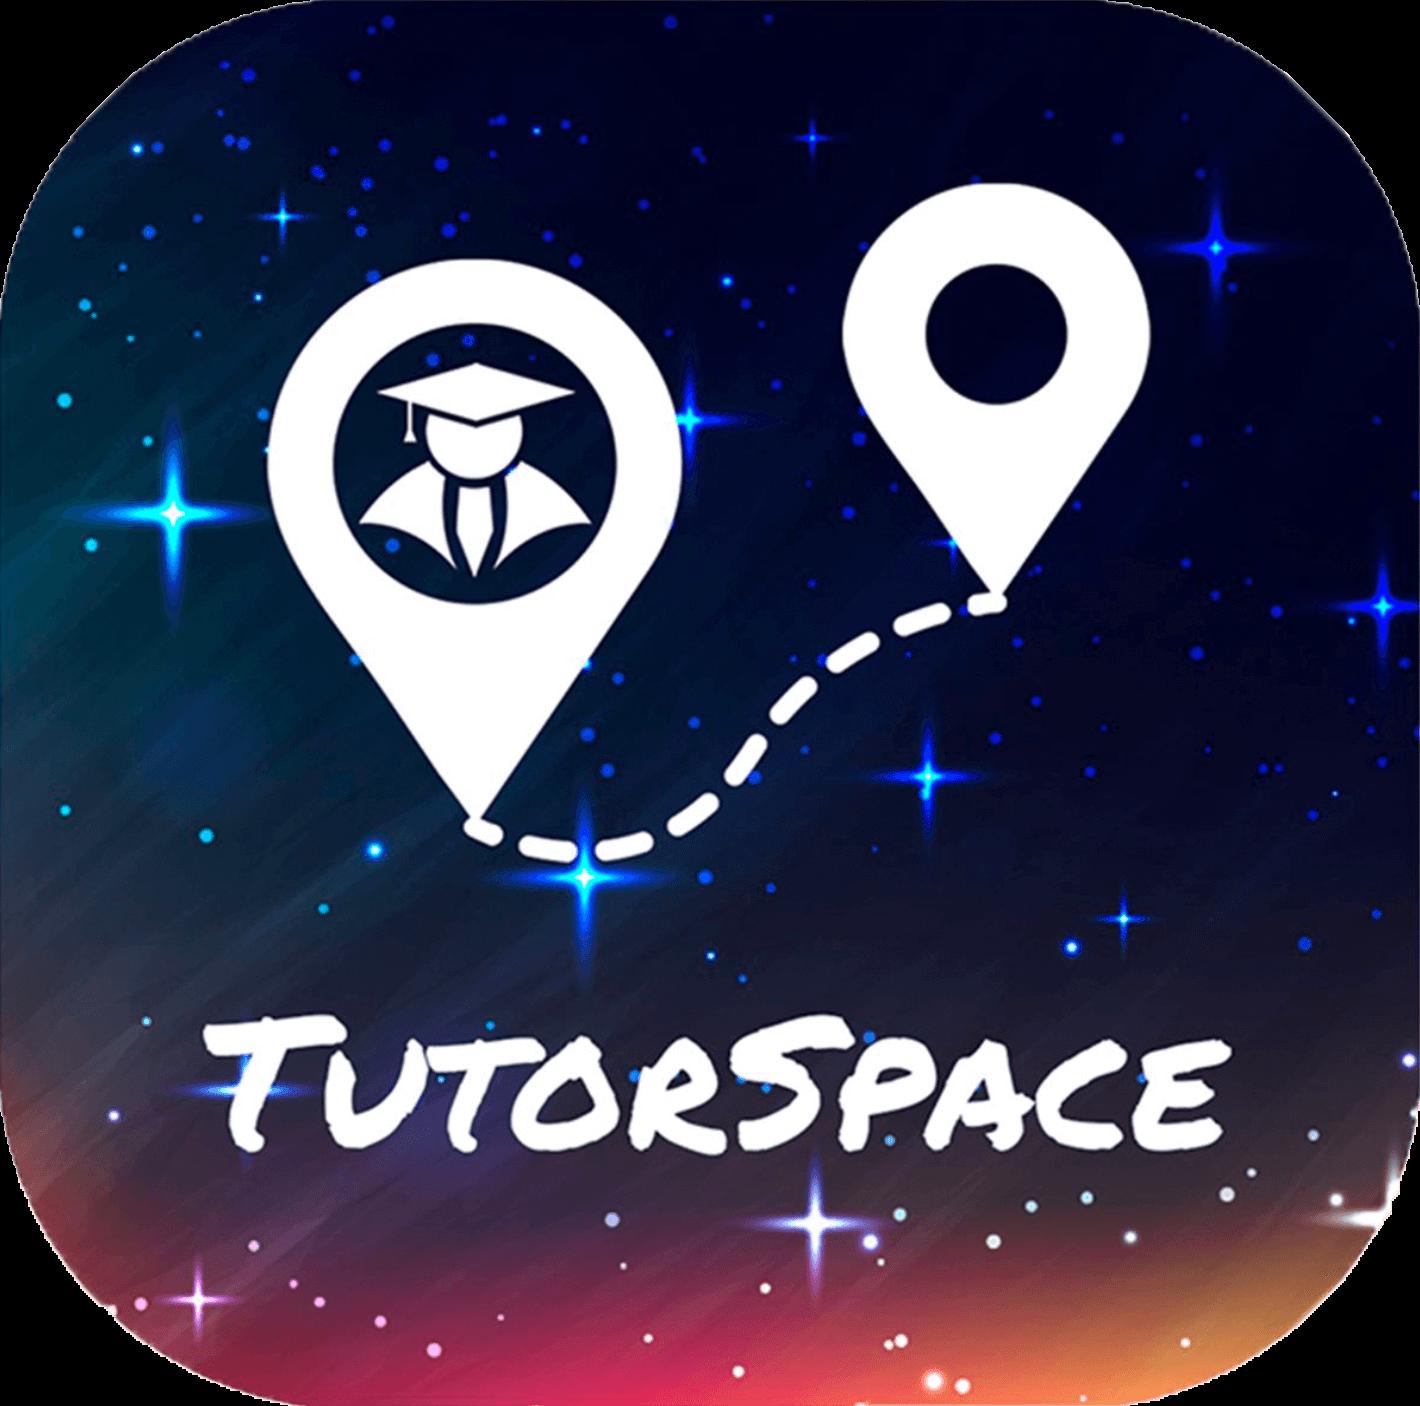 Logo Tutorspace